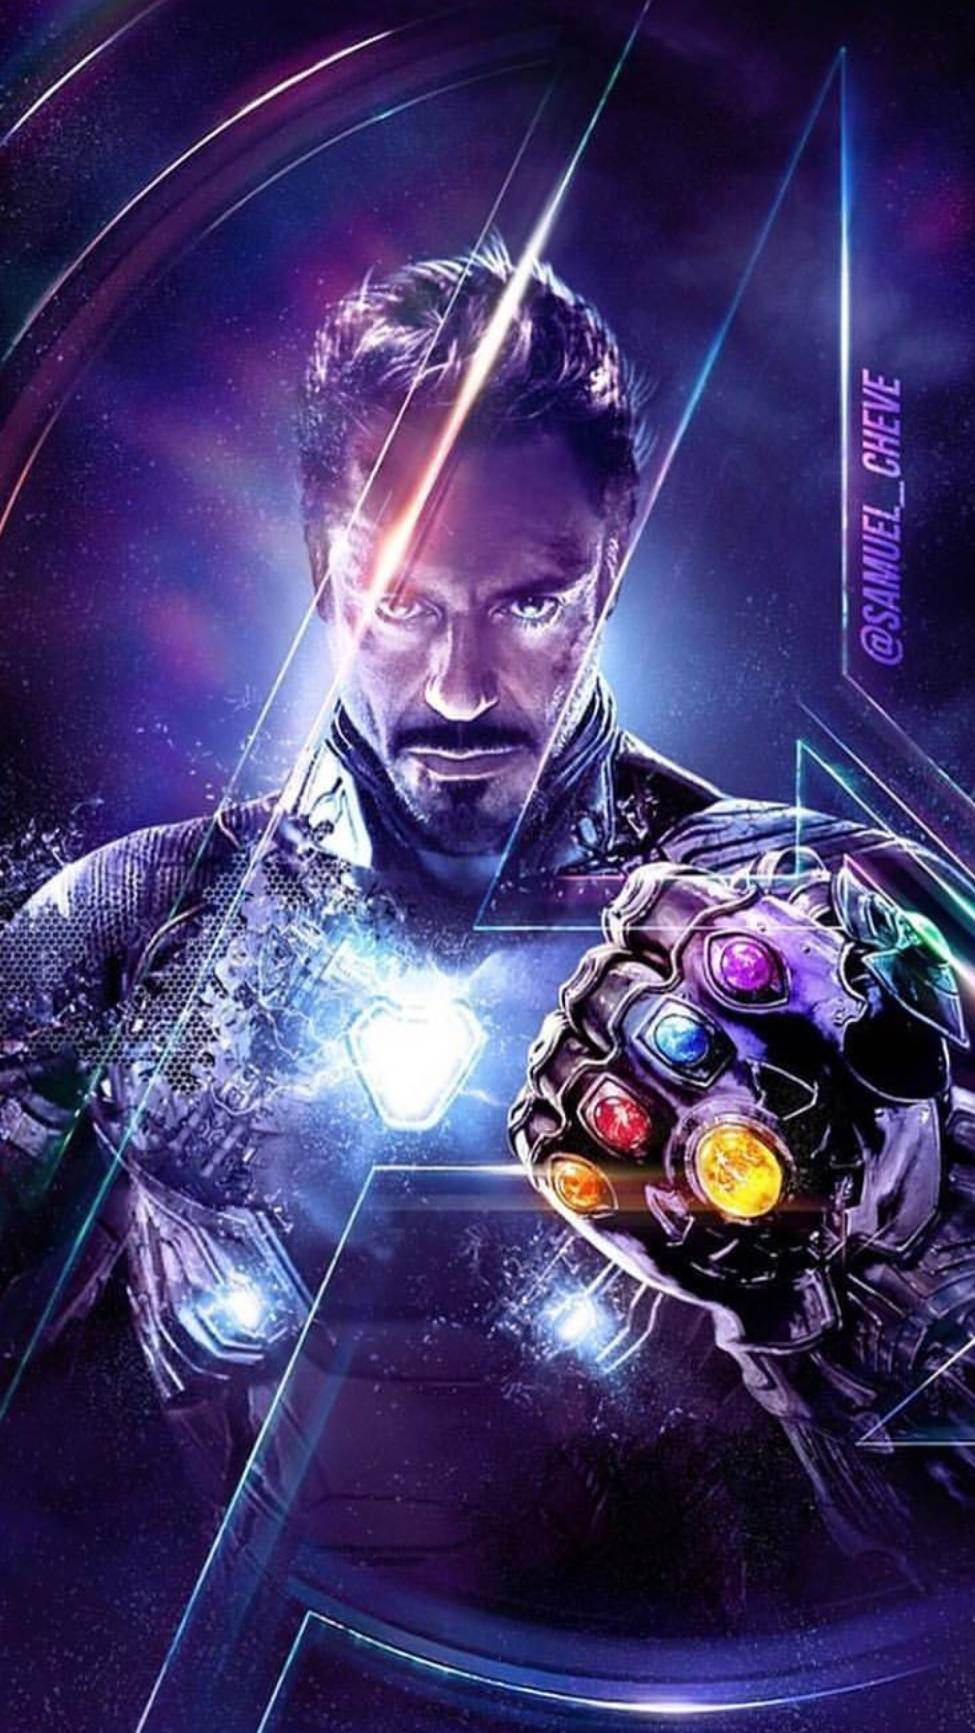 26 Tony Stark Endgame Wallpapers On Wallpapersafari